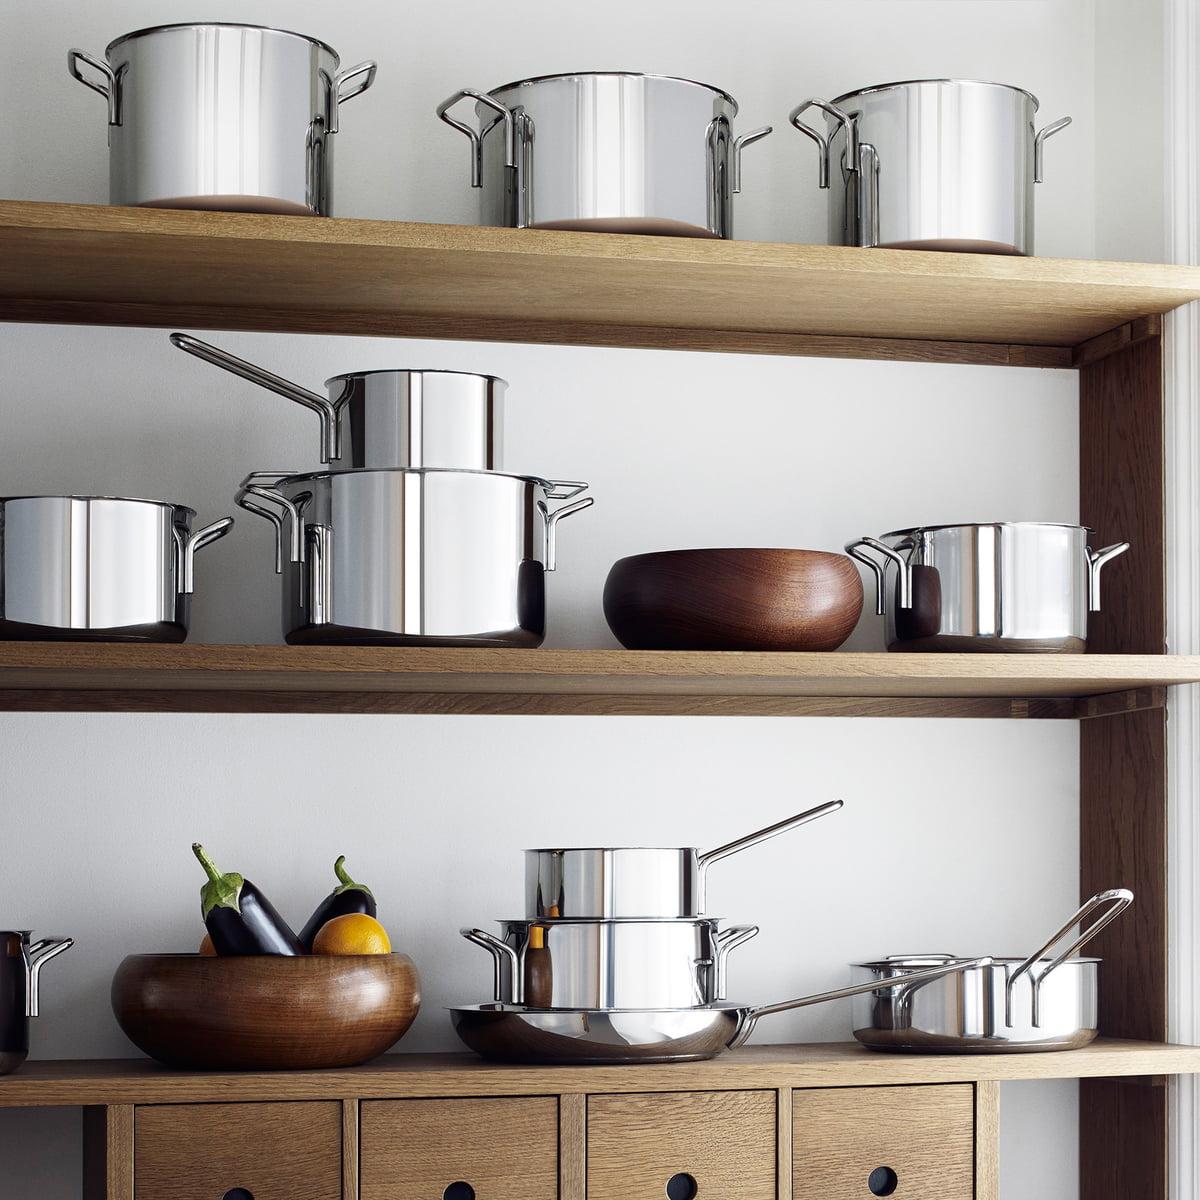 lot d 39 ustensiles de cuisine de base eva trio connox. Black Bedroom Furniture Sets. Home Design Ideas